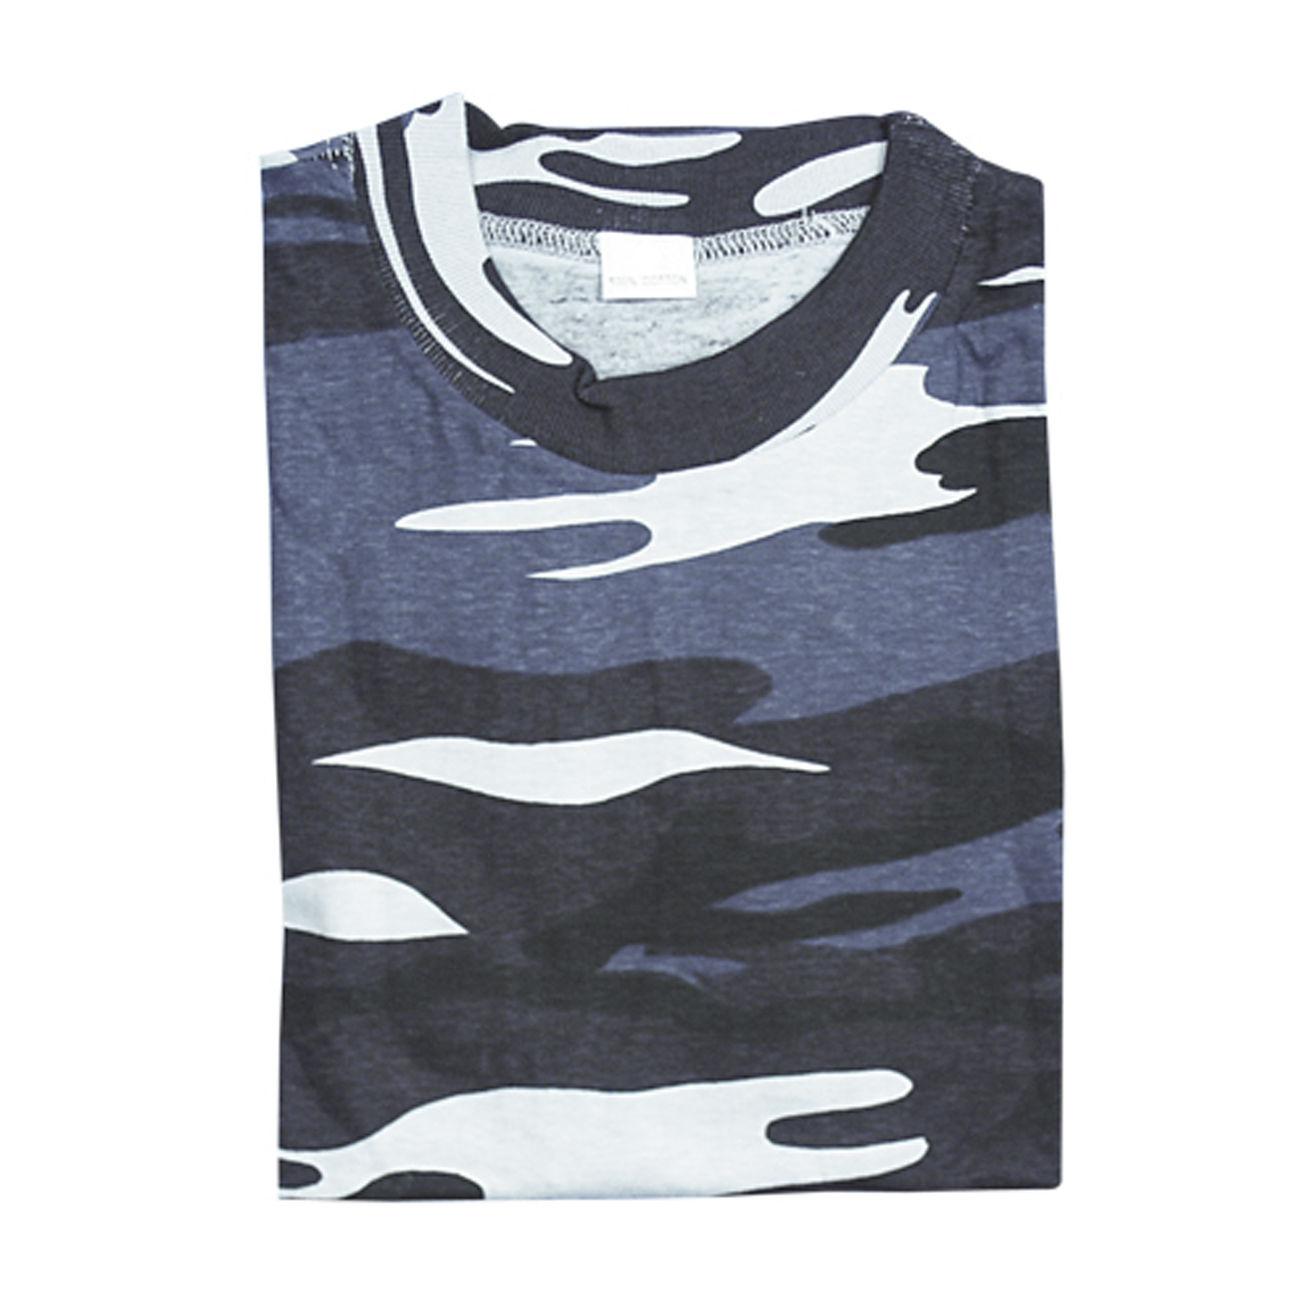 950f6525333022 MMB T-Shirt sky-blue günstig kaufen - Kotte & Zeller